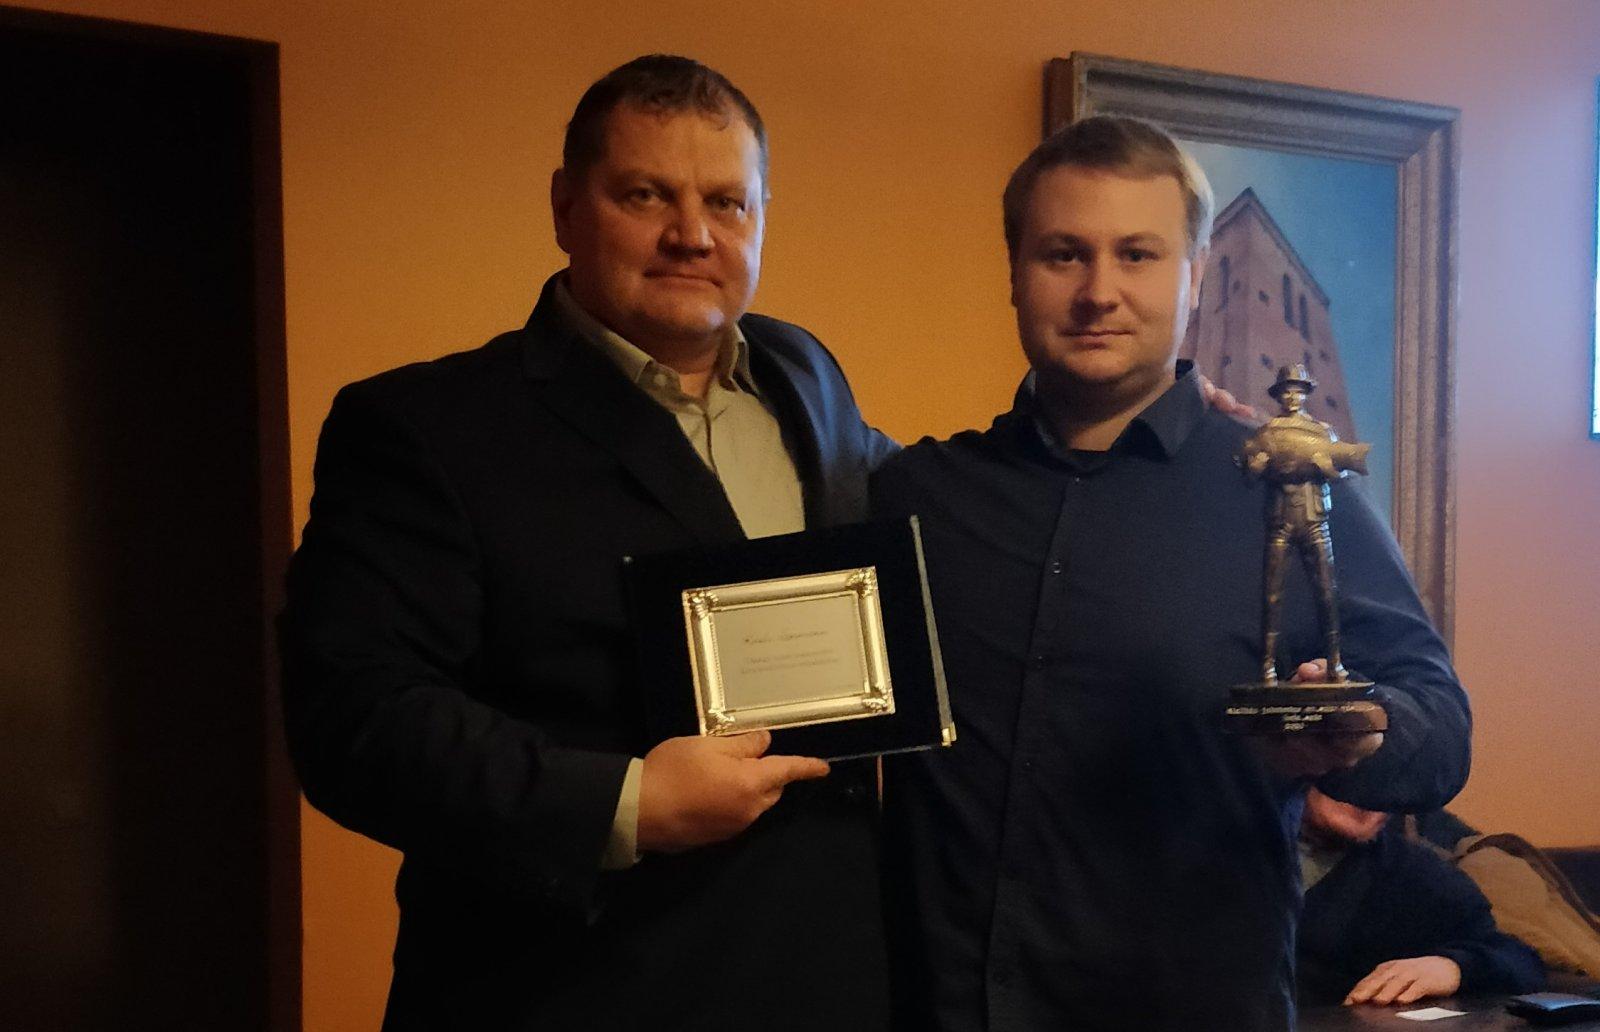 Eesti Jõutõsteliidu presidendiks sai Alexander Andrusenko